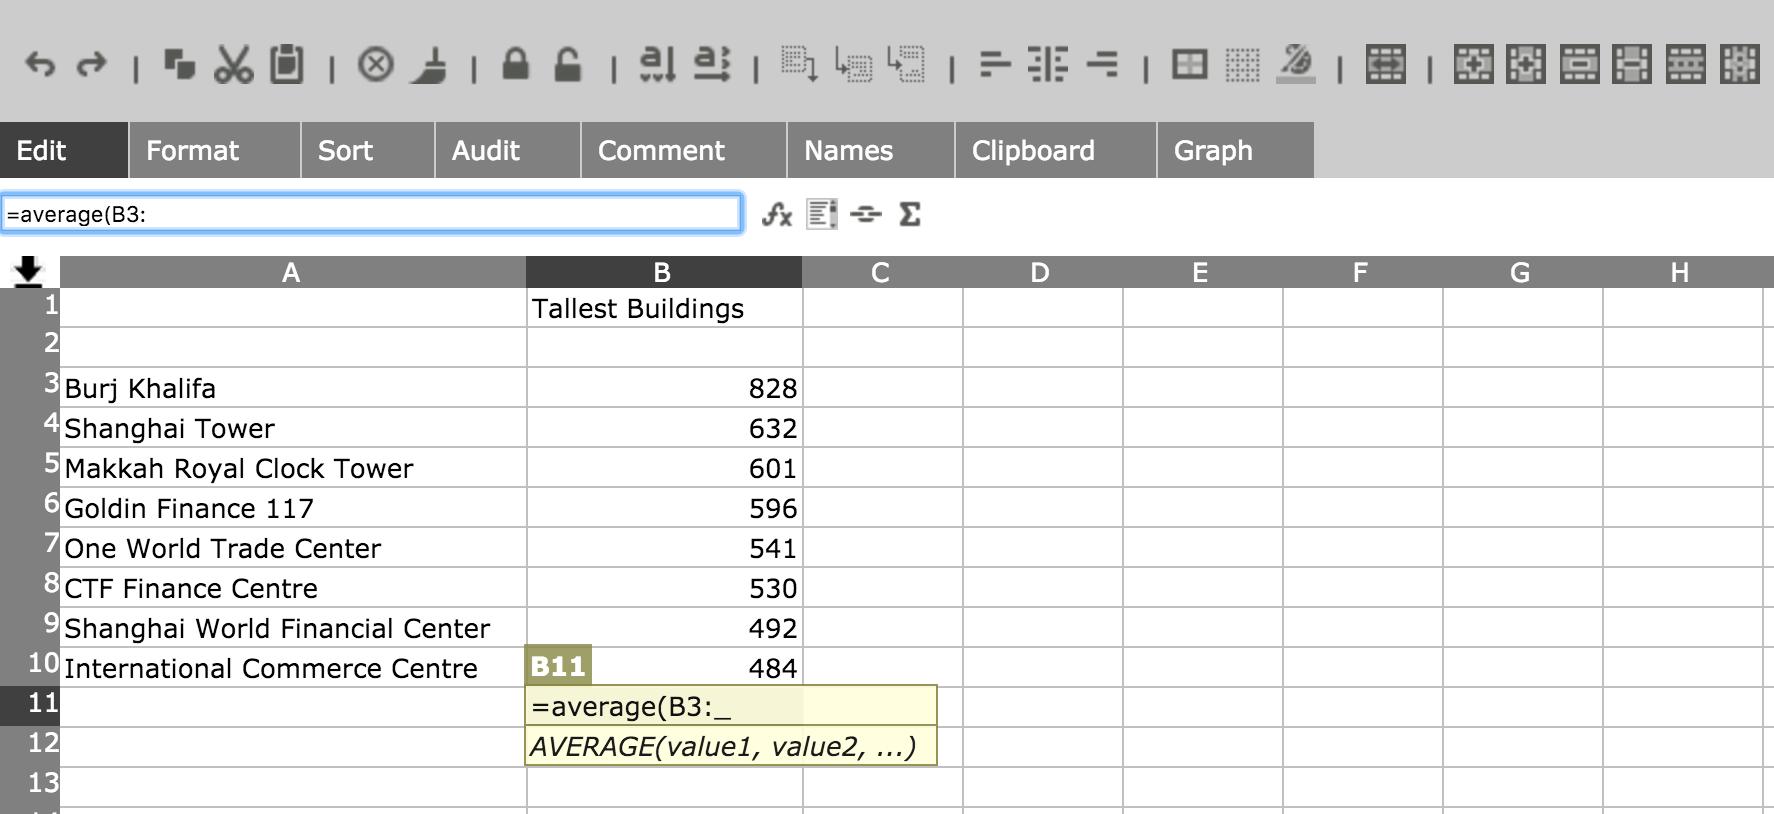 Share Excel Spreadsheet Online | Homebiz4U2Profit Inside Excel Spreadsheets Online